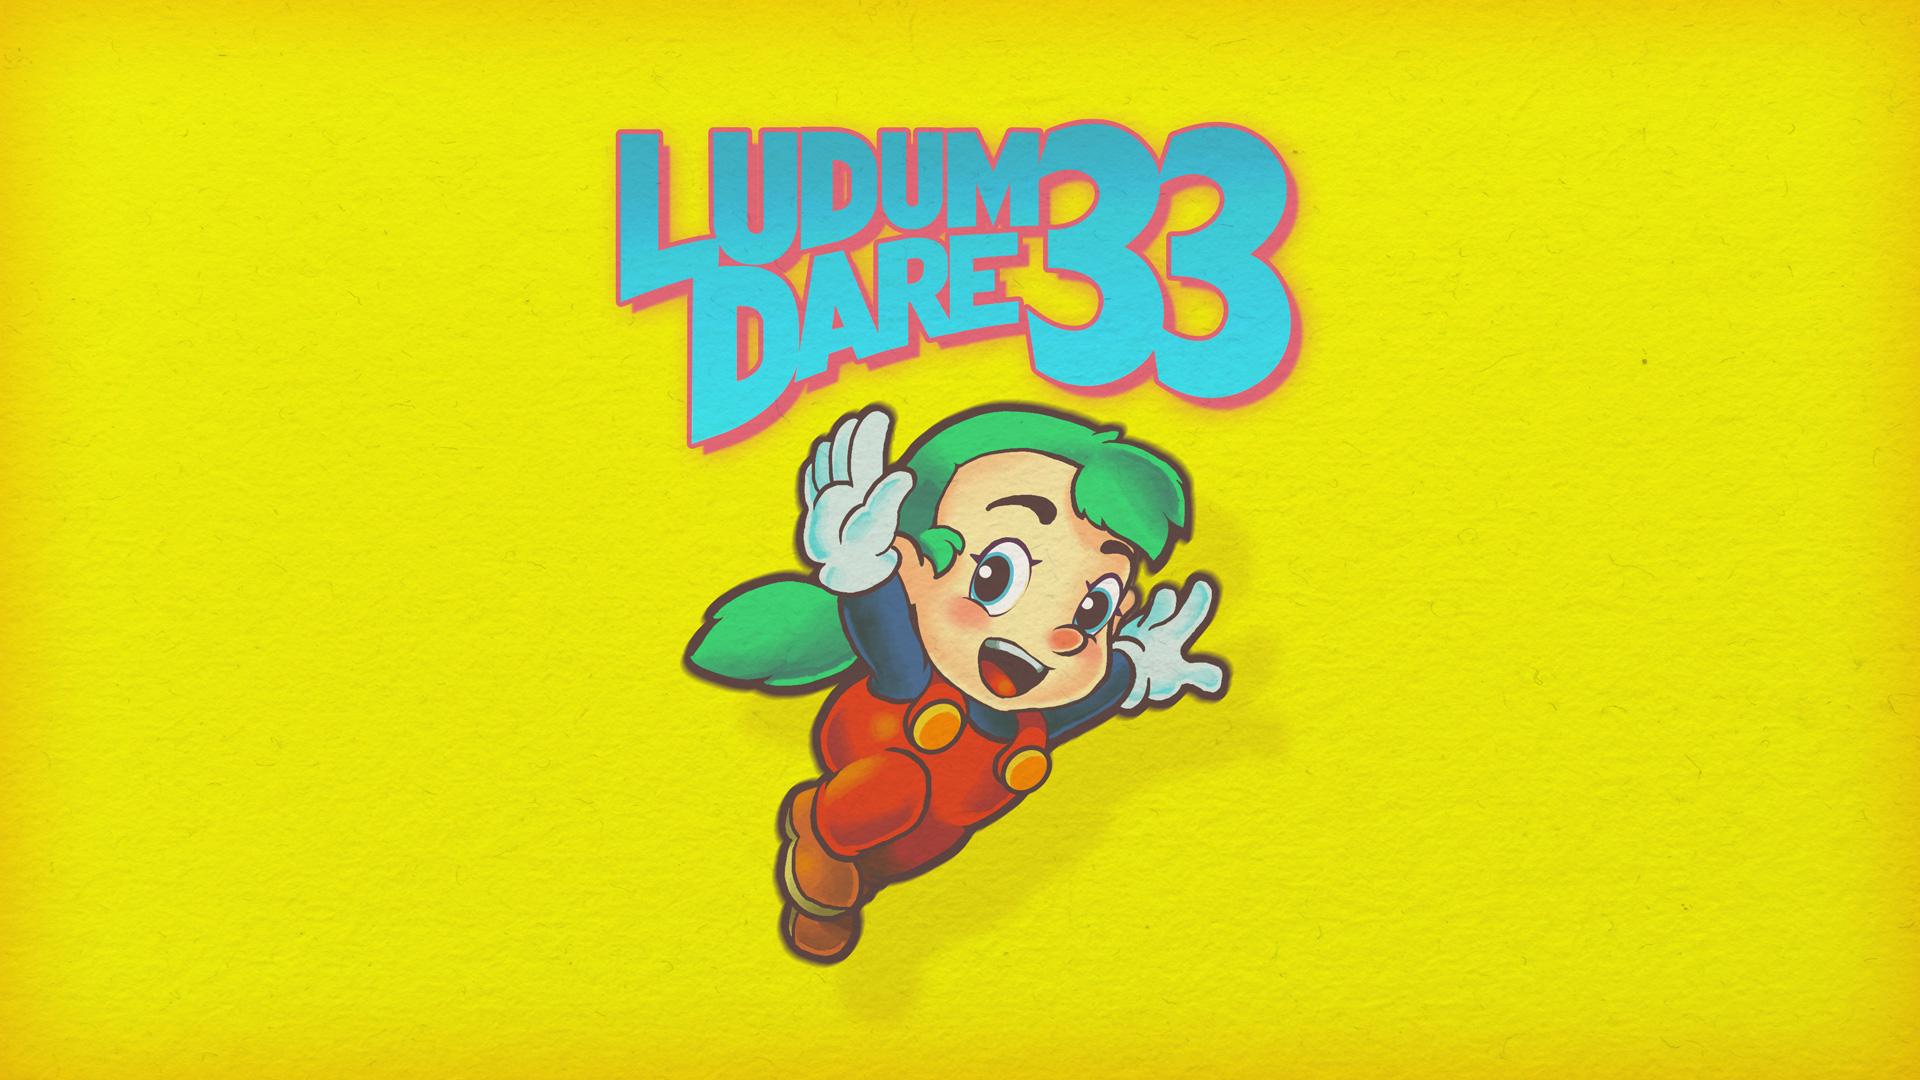 Ludum Dare 33 Wallpaper Ludum Dare 1920x1080